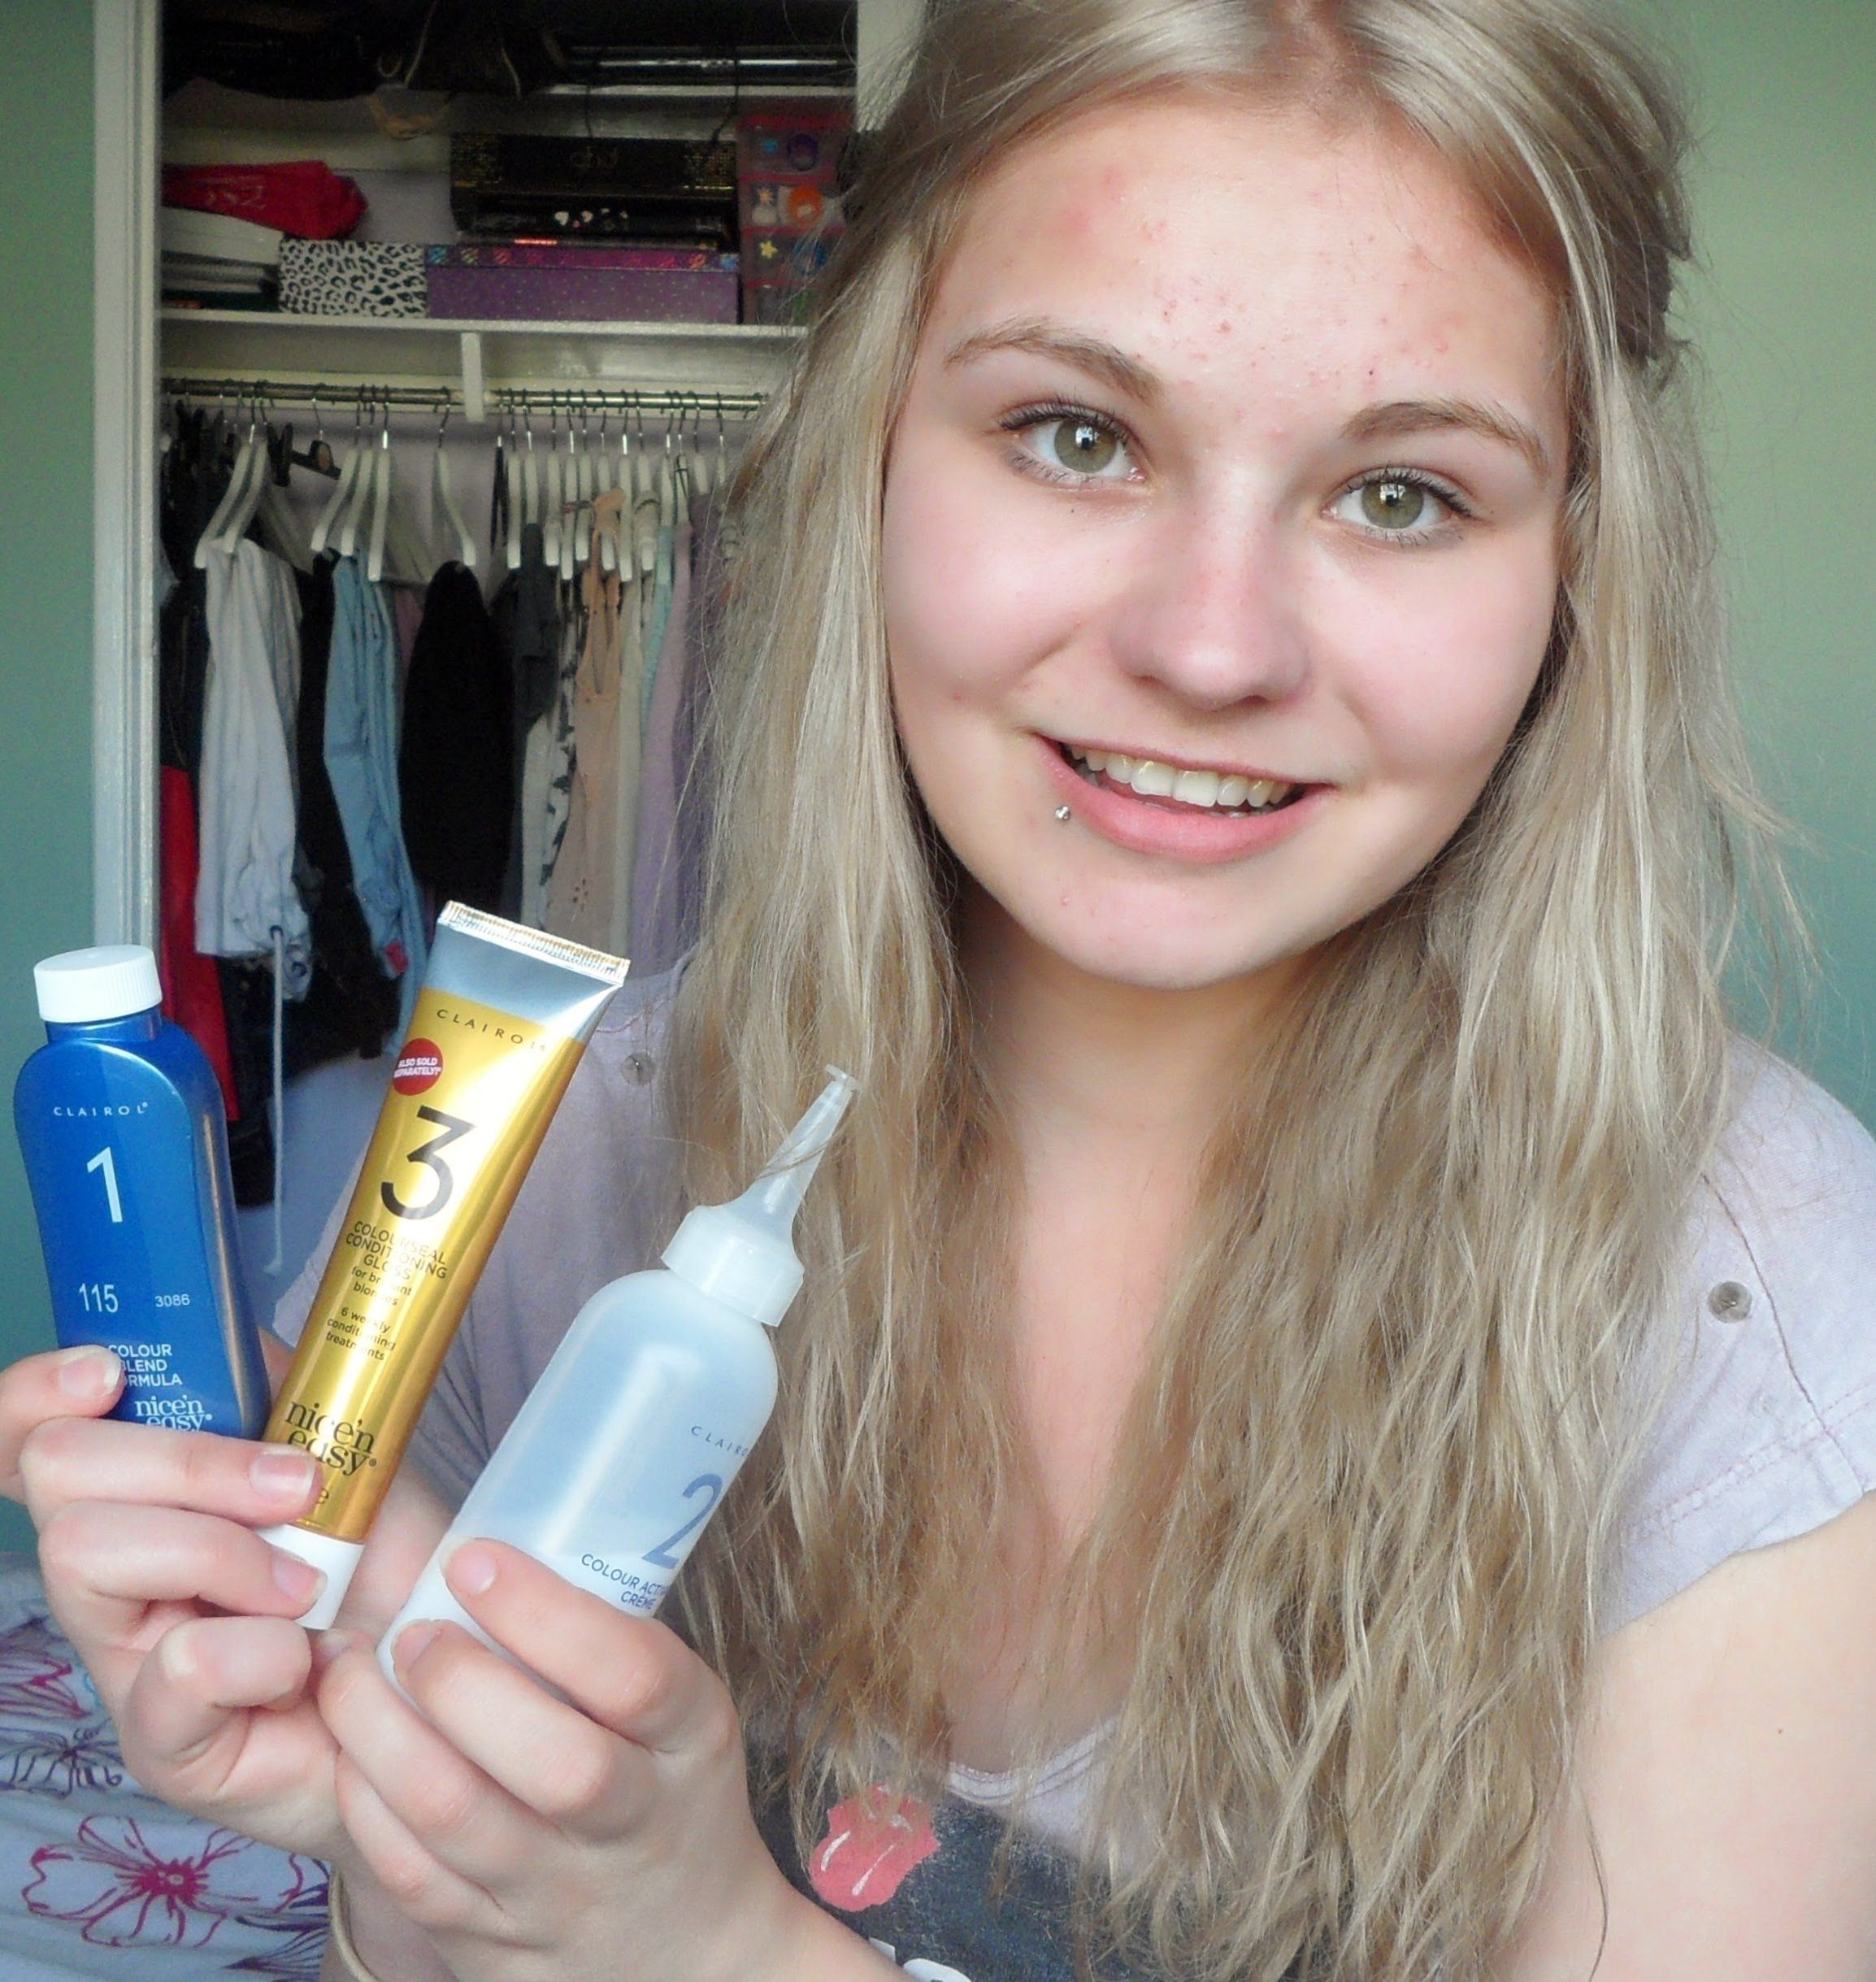 How I Dye My Hair; Blonde to Dark/Ash Blonde - YouTube #naturalashblonde How I Dye My Hair; Blonde to Dark/Ash Blonde - YouTube #naturalashblonde